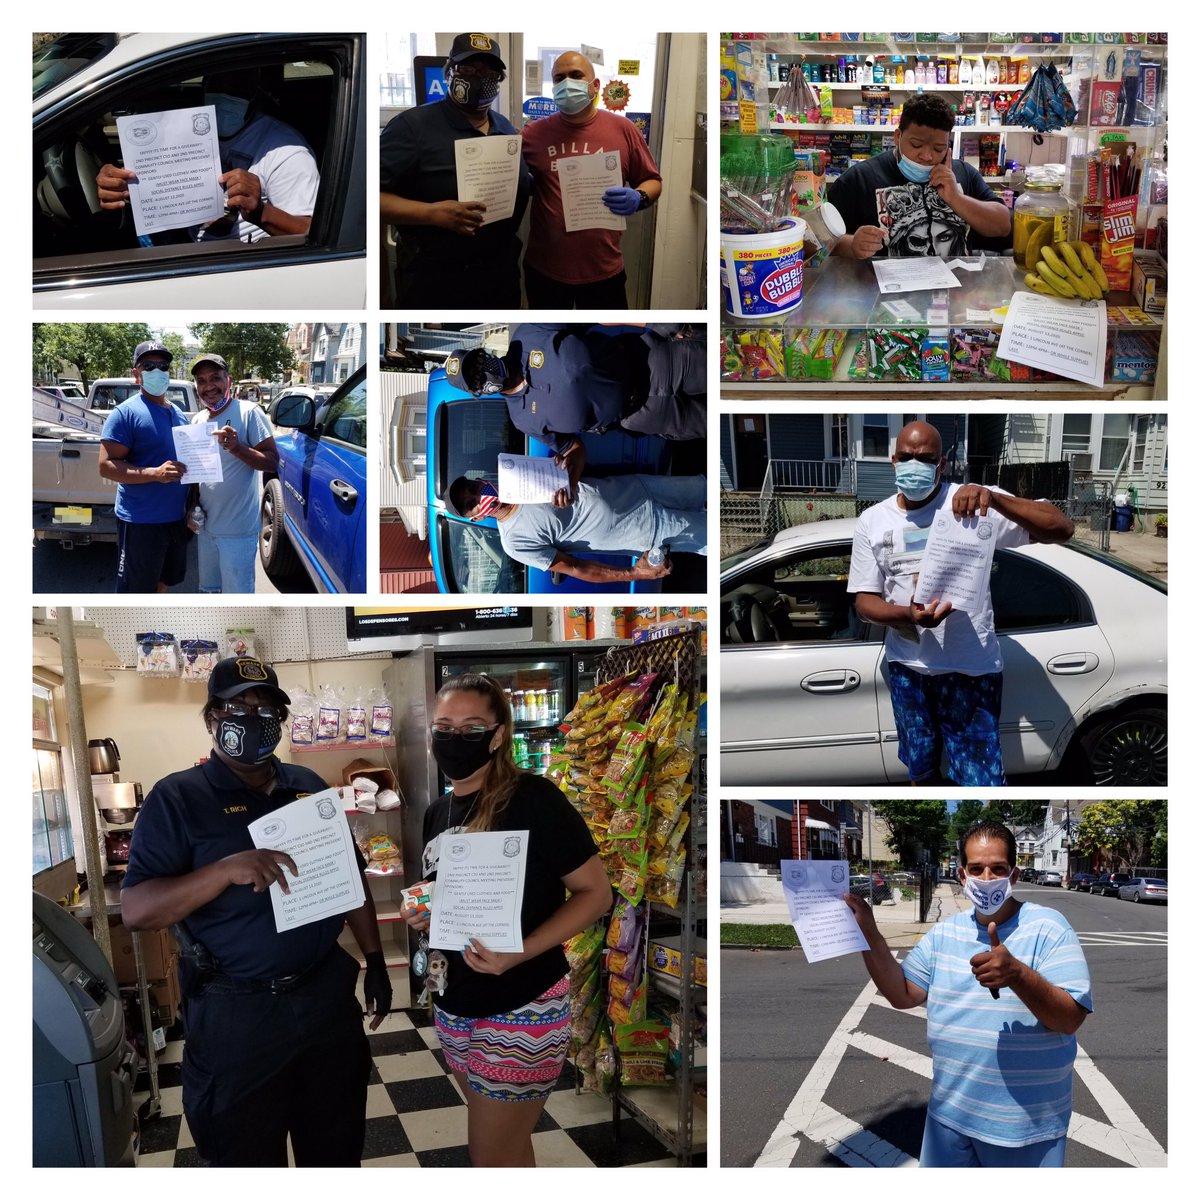 2nd Precinct Community Service Officer Rich Conducts Community Outreach  via @Nextdoor